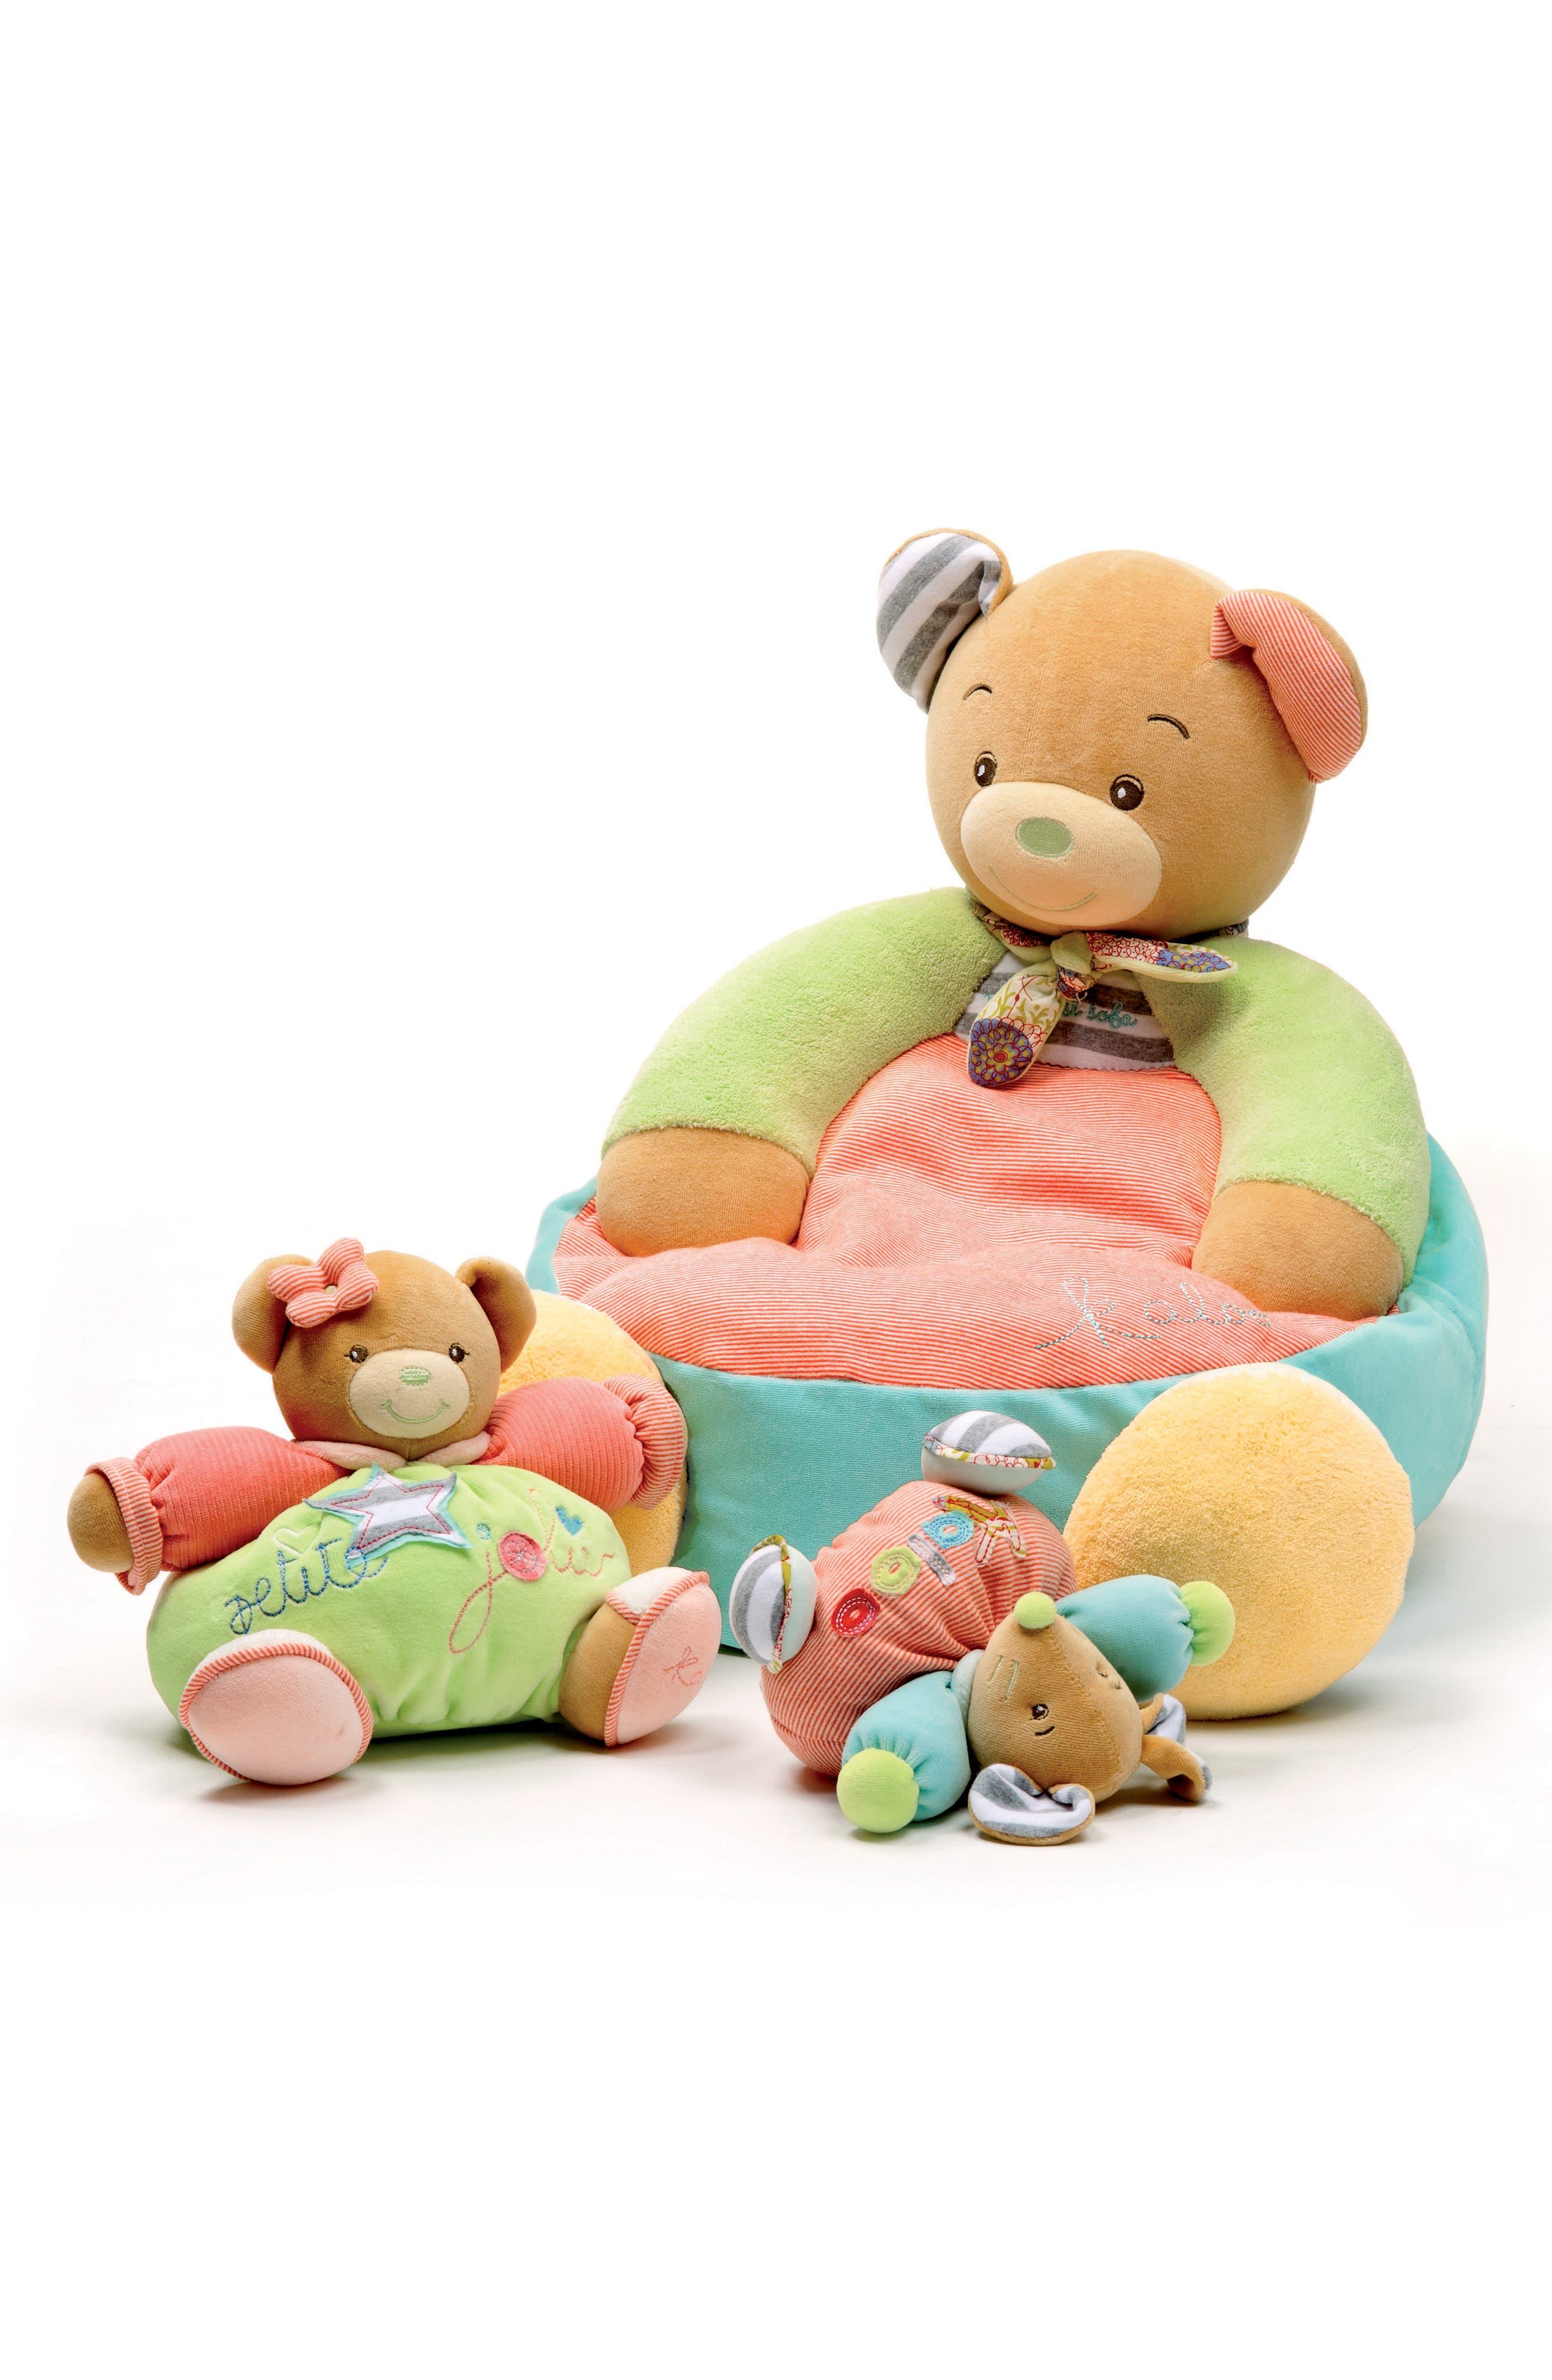 Bliss Bear Stuffed Animal,                         Main,                         color, MULTI